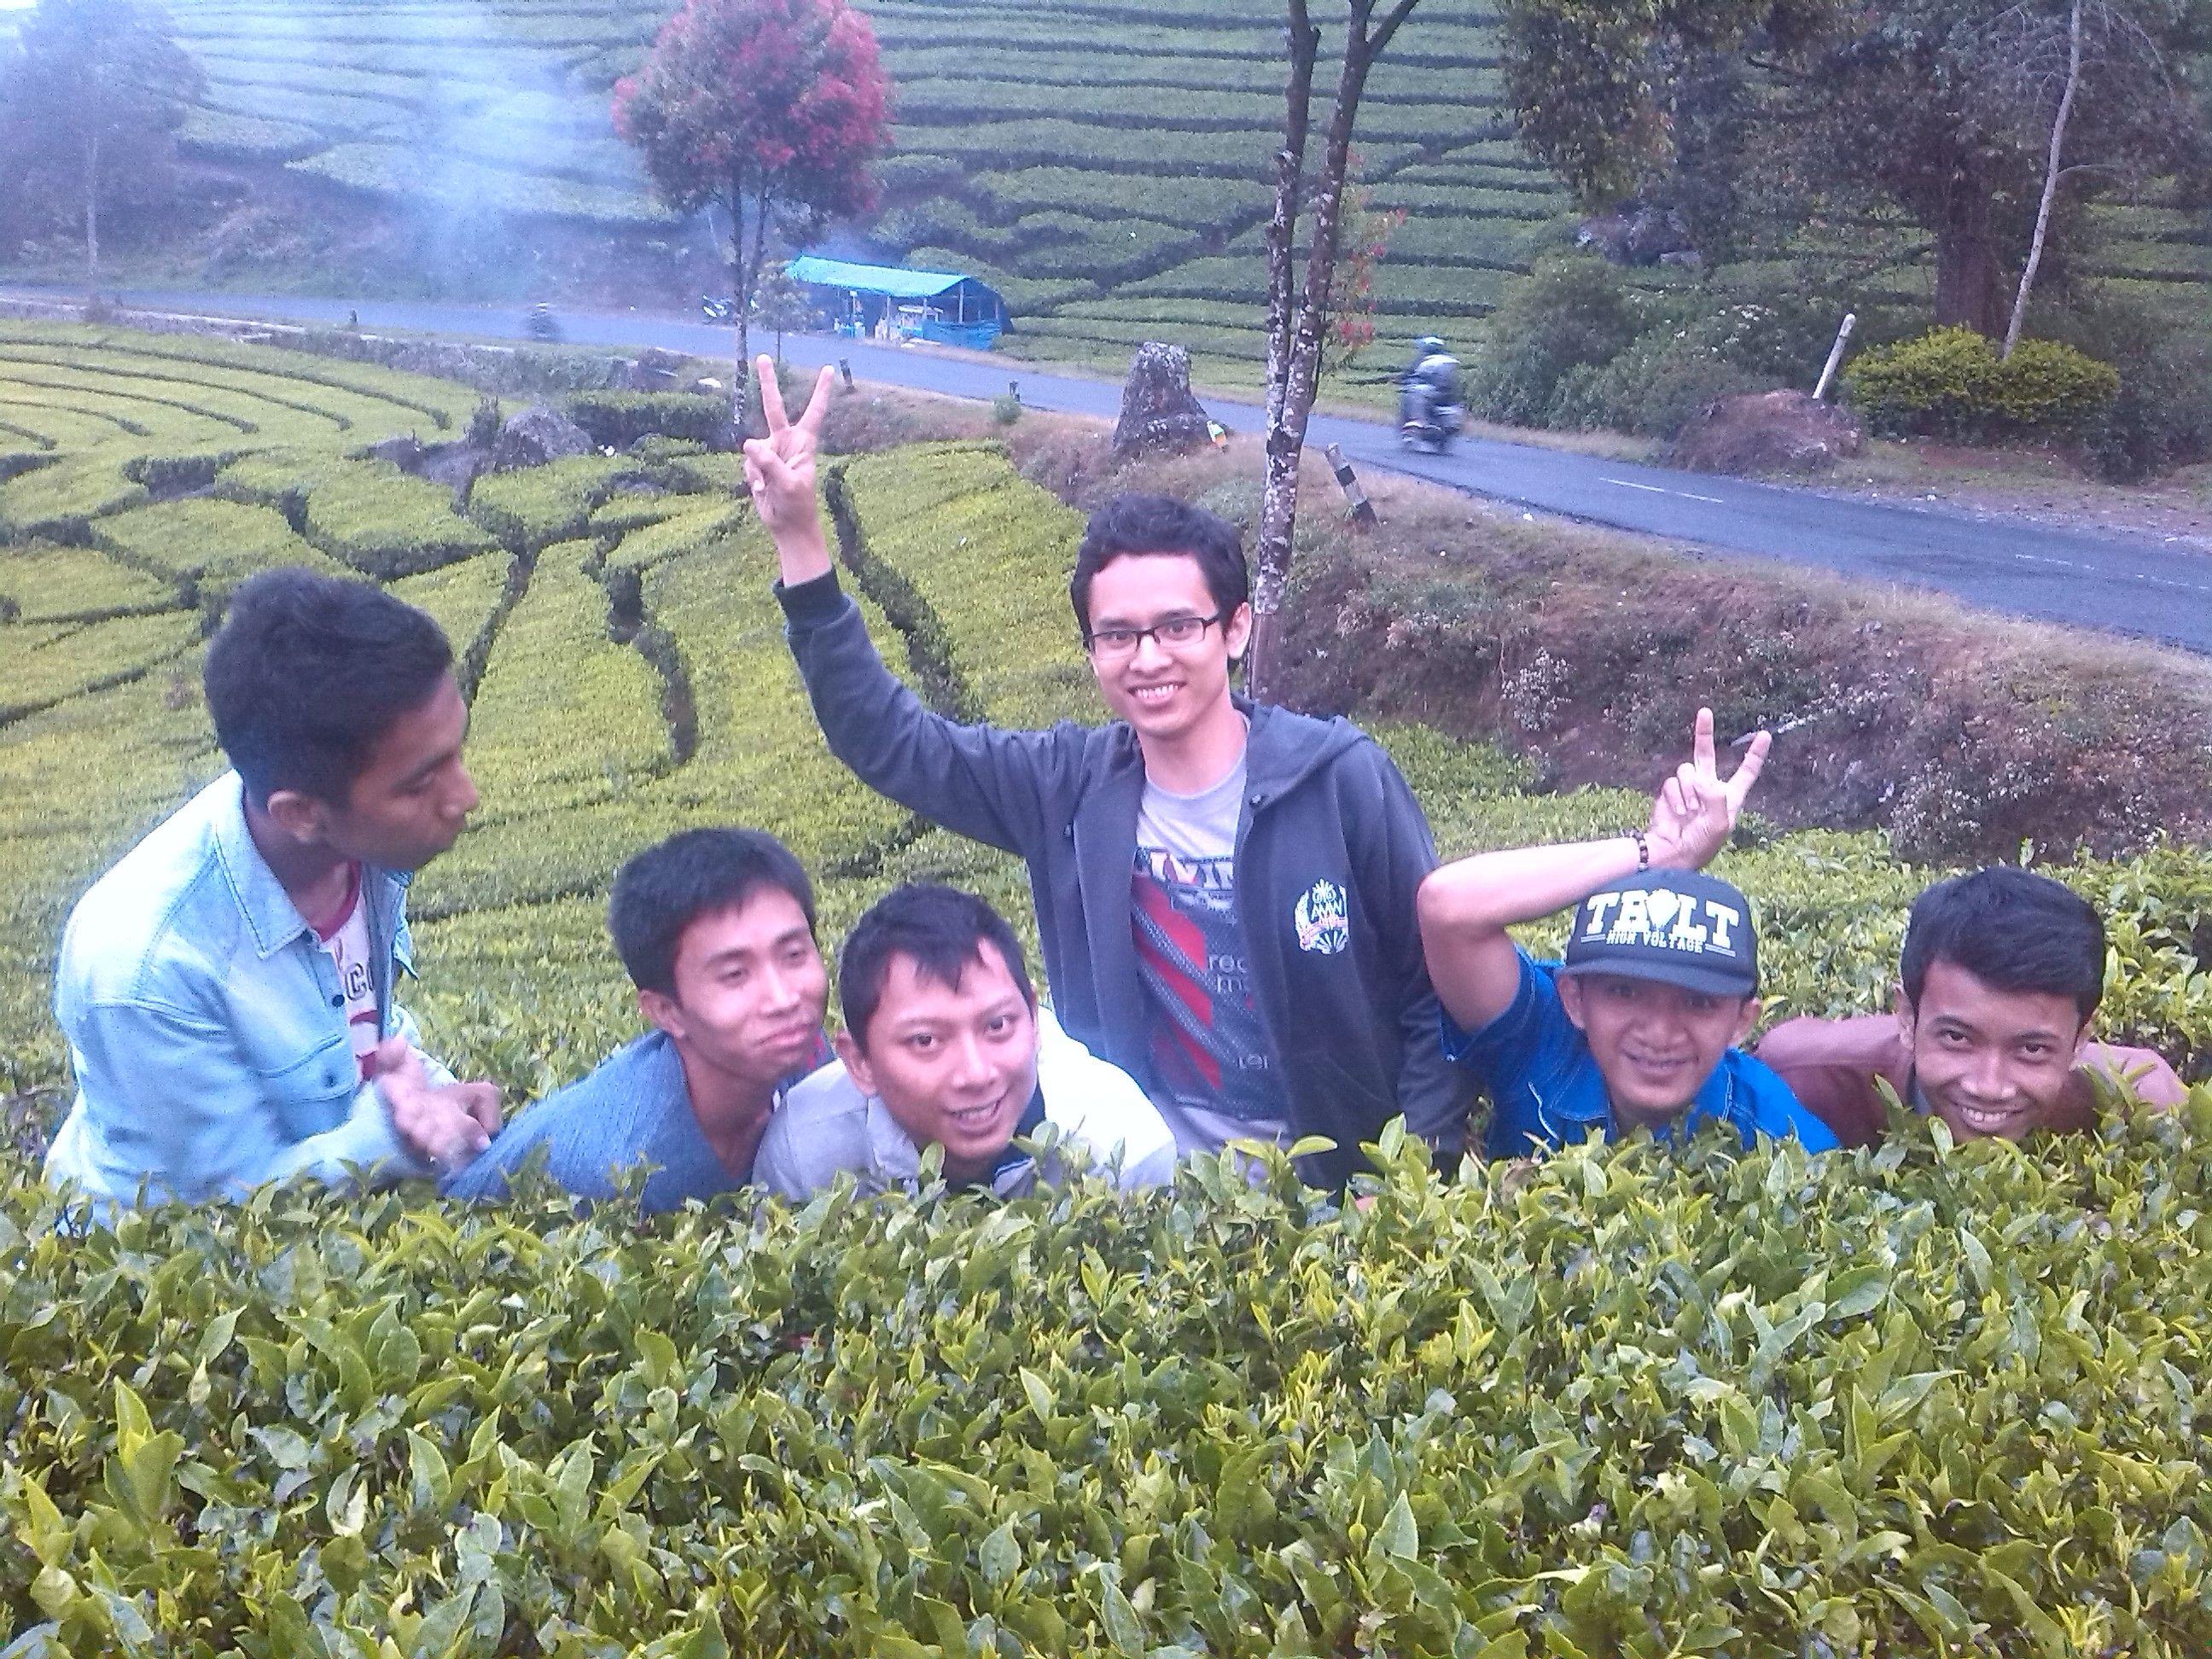 Harga Paket Tour Ciwidey Bandung Update 2018 Stoking Leging Wanita Pentyhouse Apple Sexy Hitam Coklat All Size Muat S L Kawah Putih Merupakan Tempat Wisata Paling Populer Masa Ini Yang